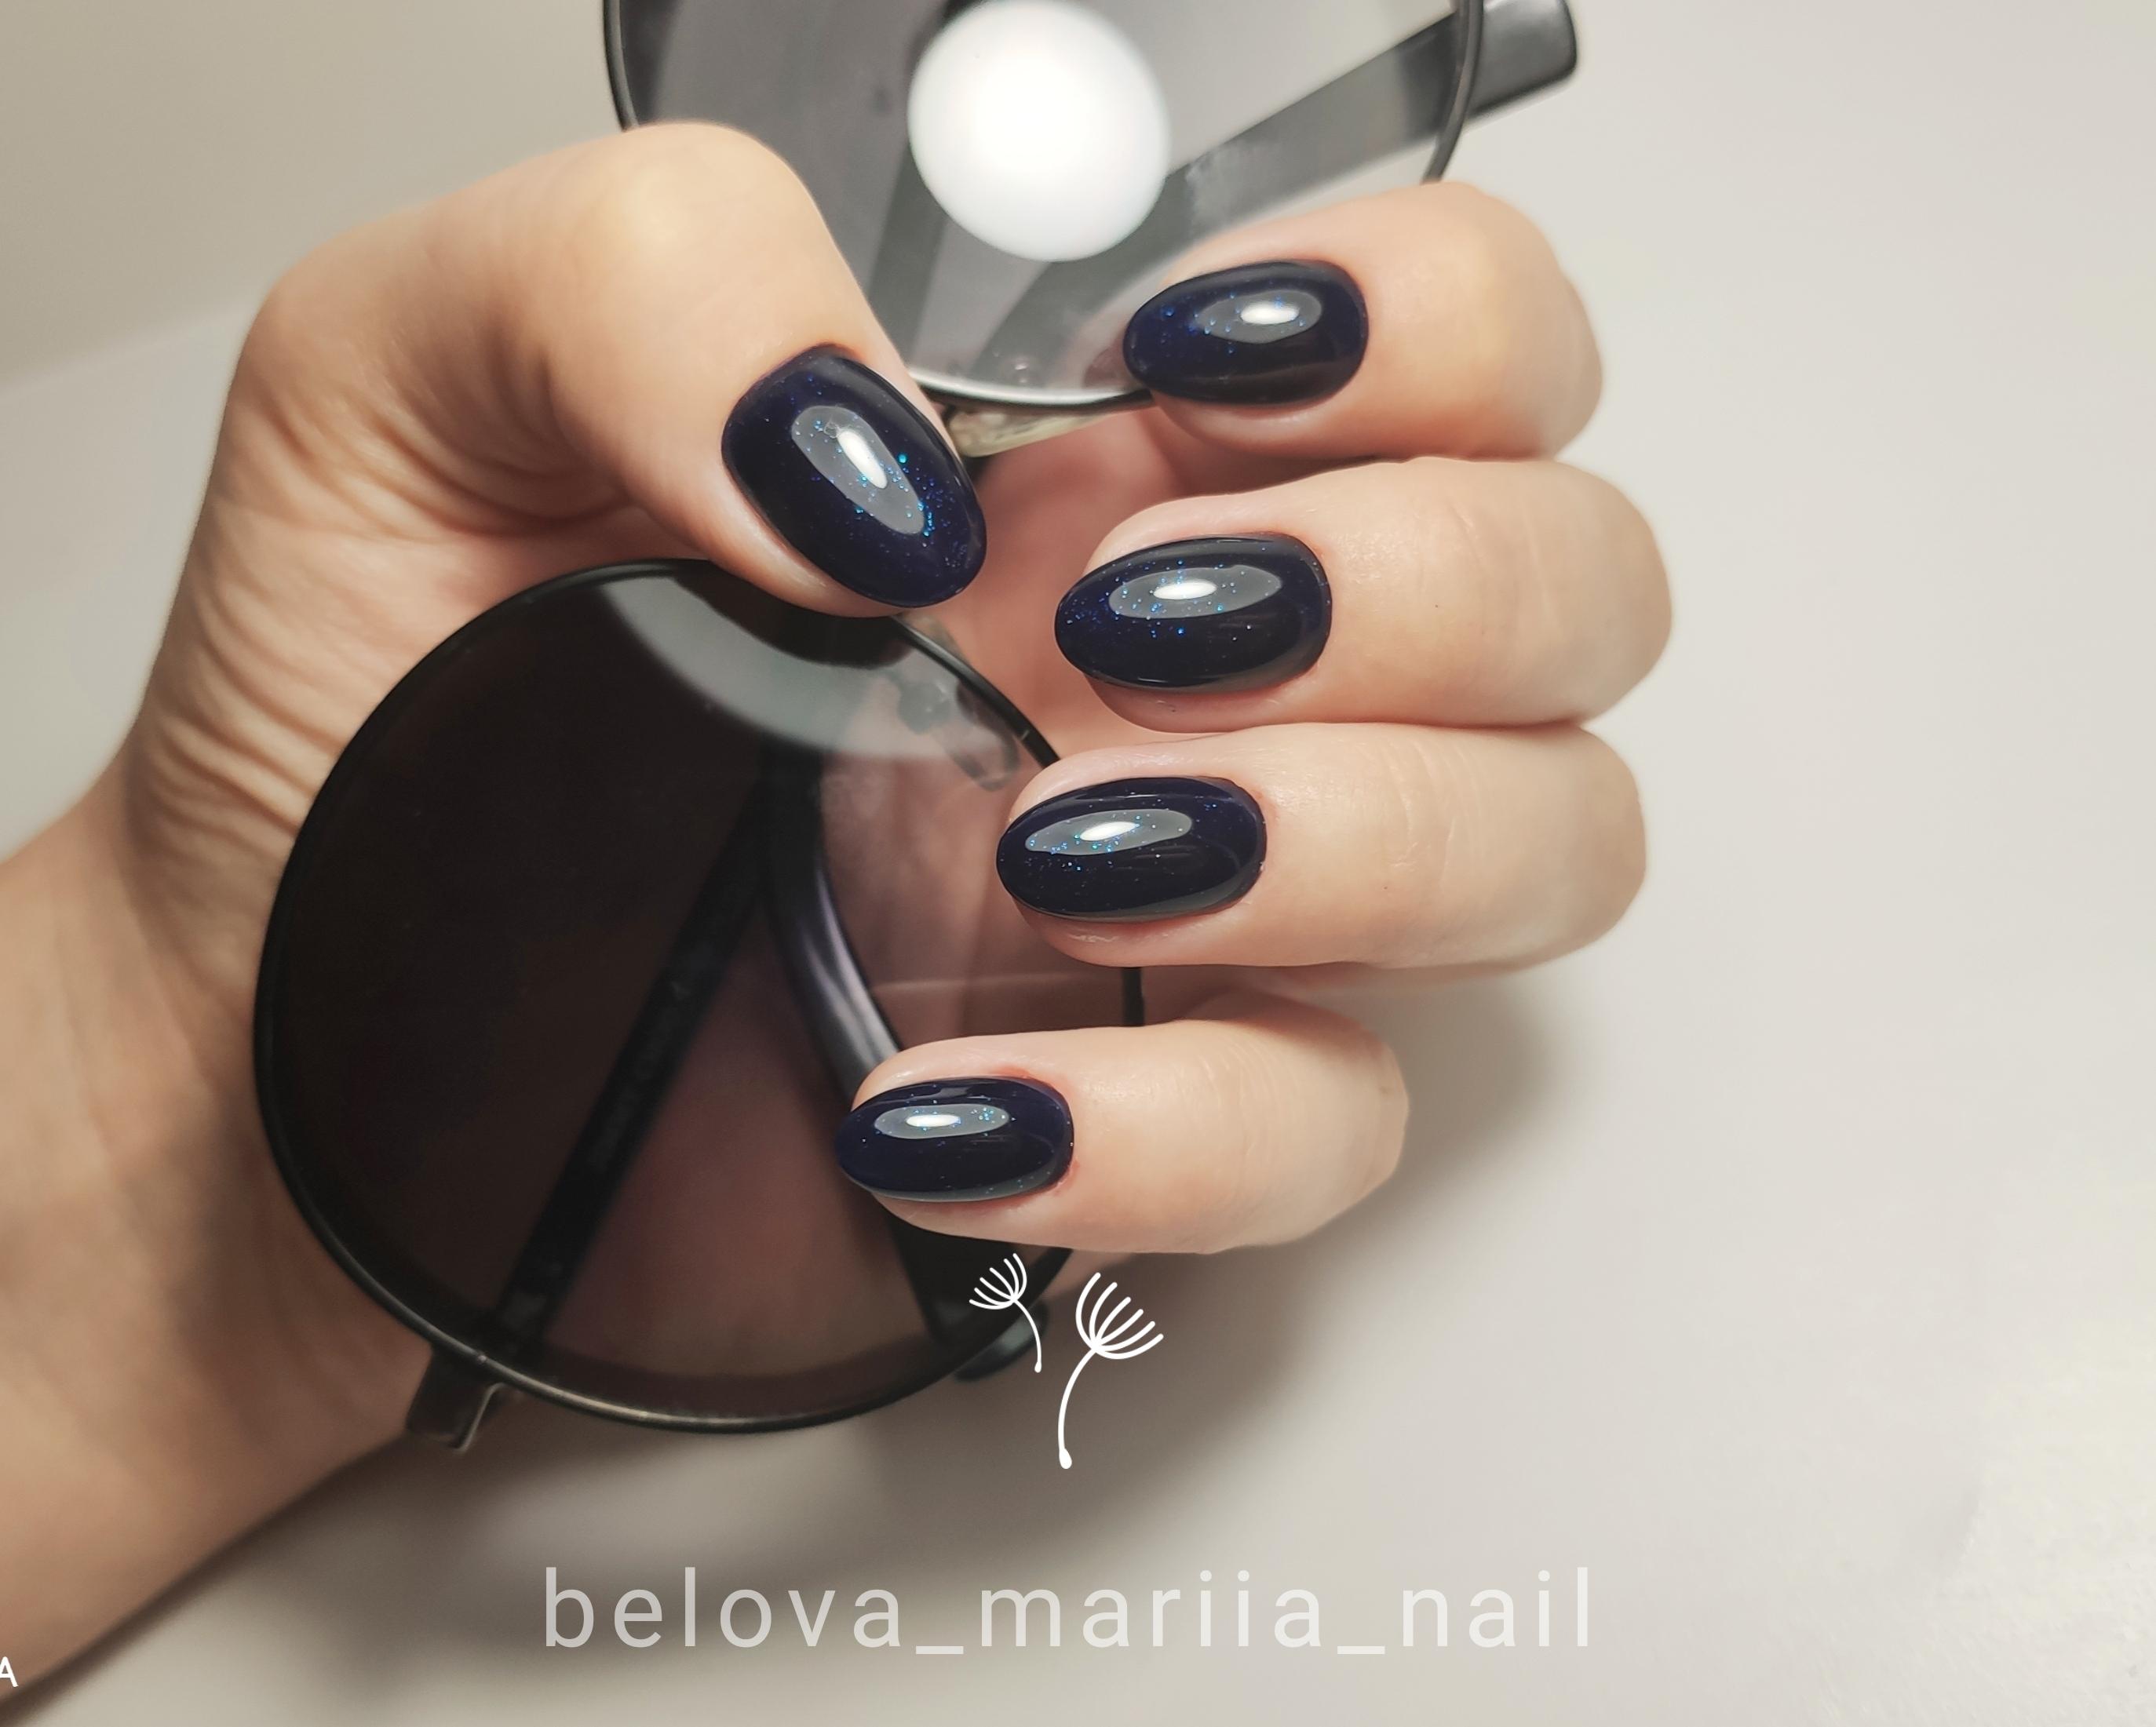 Маникюр в темно-синем цвете на короткие ногти.